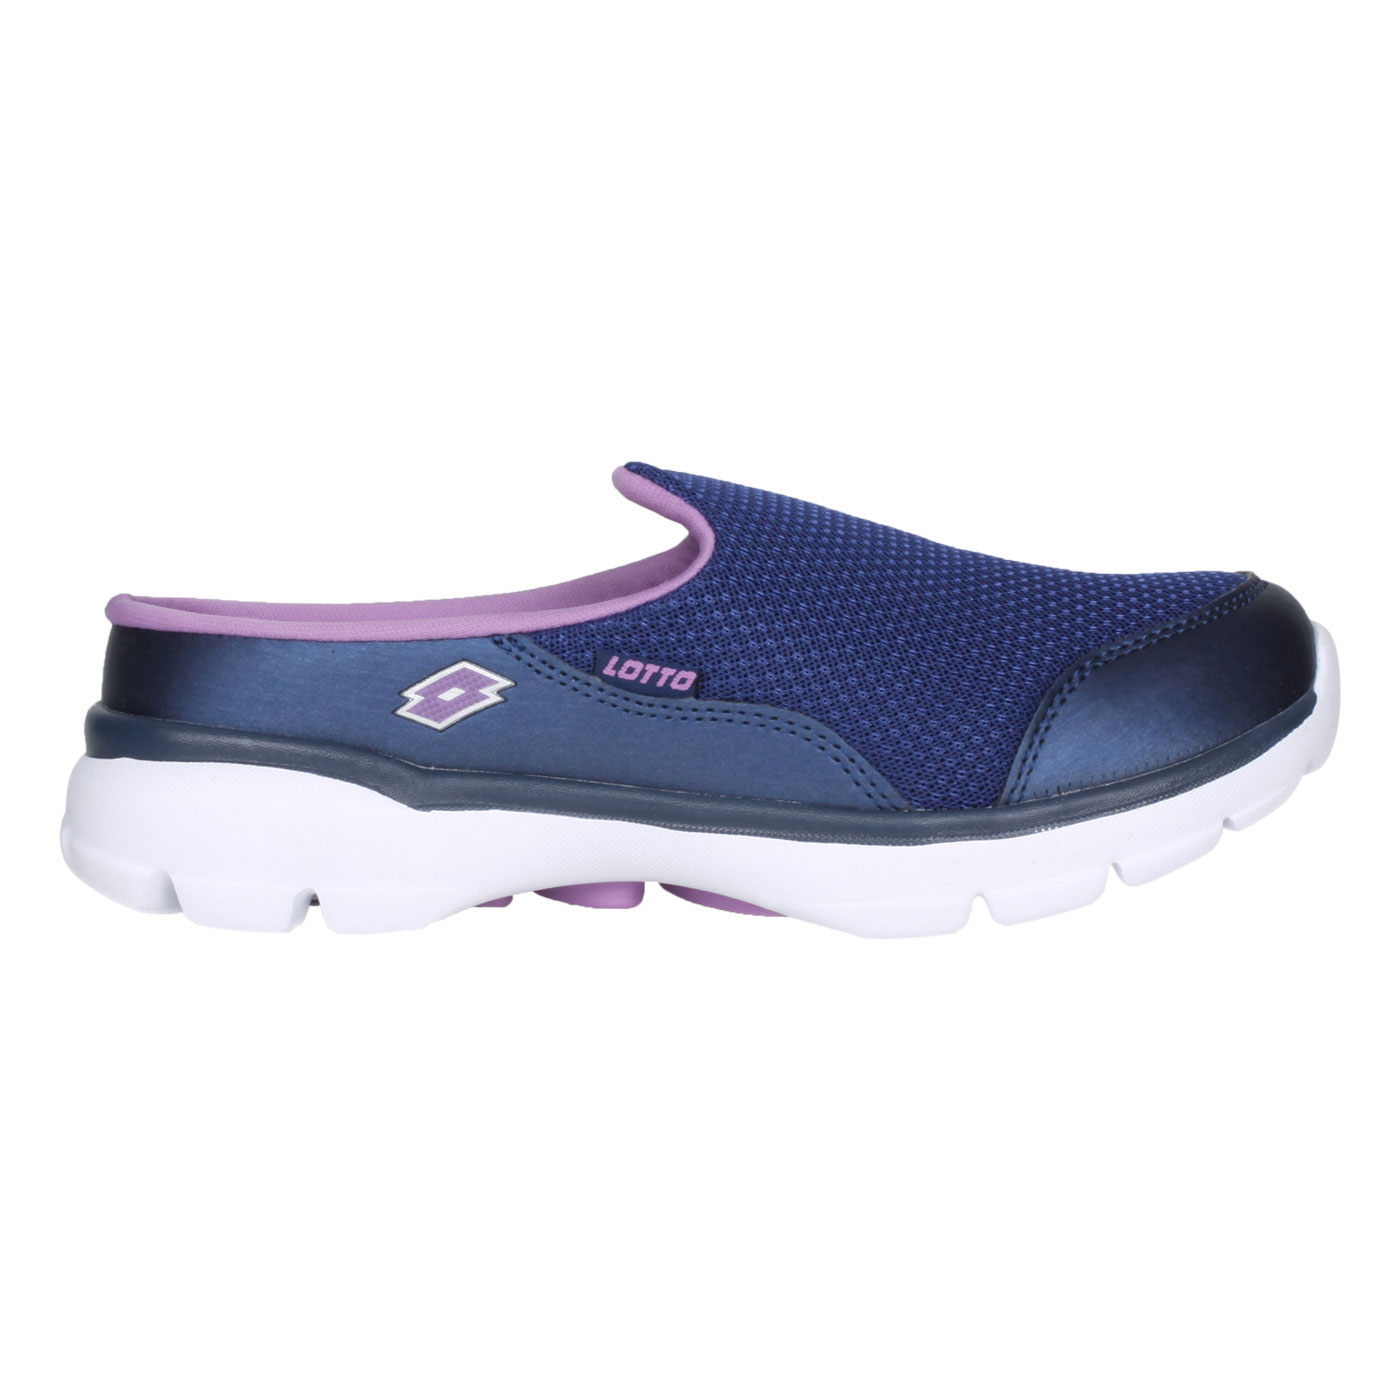 LOTTO 女款EASY WEAR穆勒健走鞋 LT1AWX3706 - 深藍紫